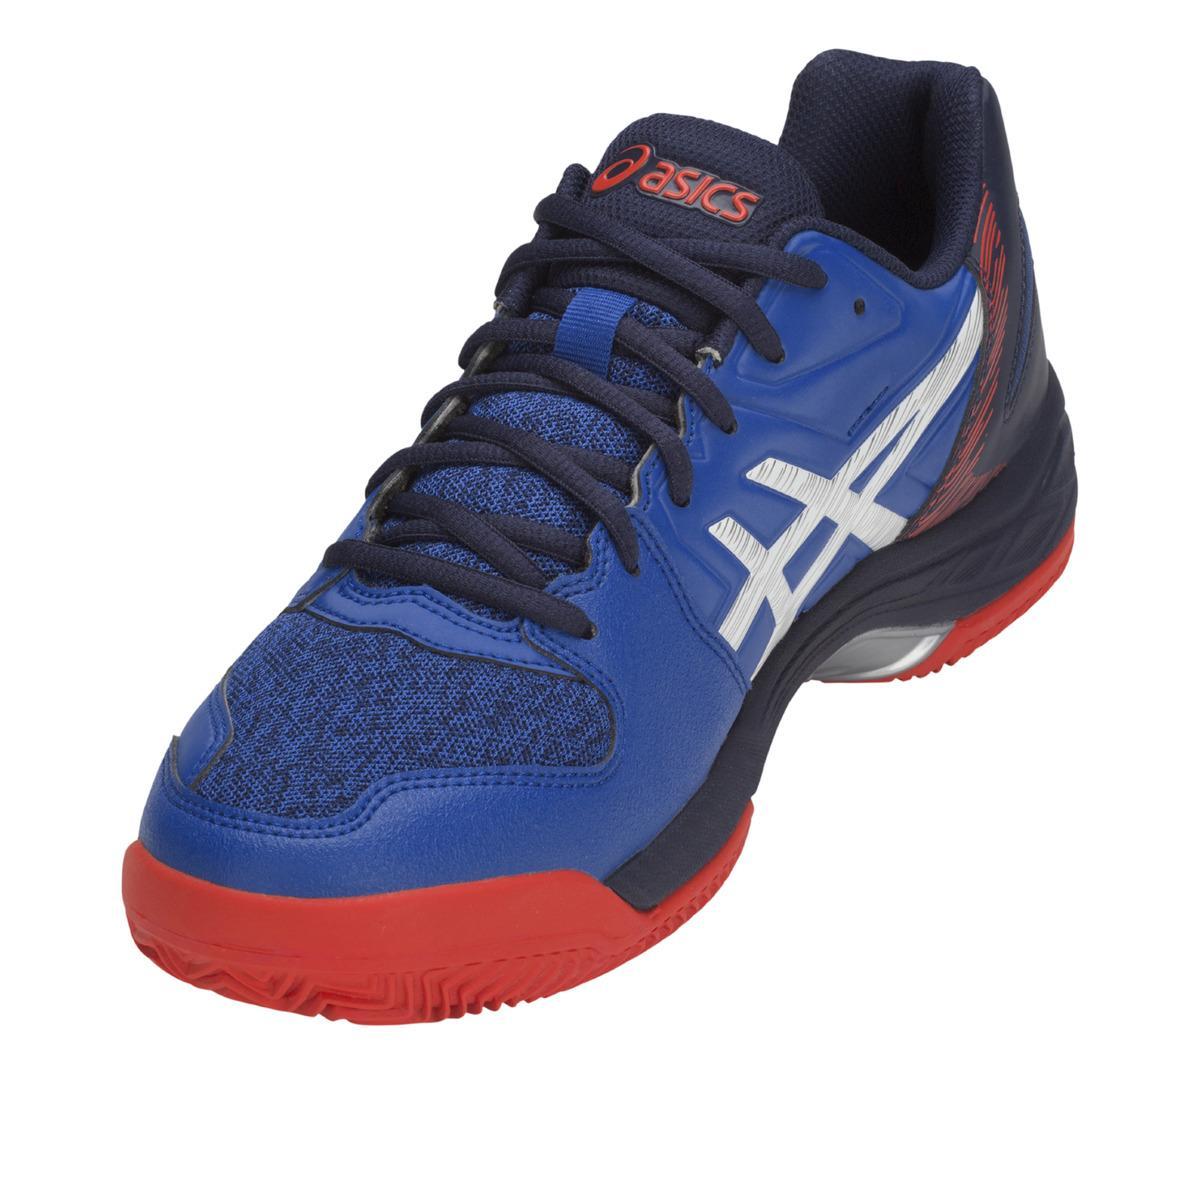 3aed4c6c4c Men's Blue Gel-padel Exclusive 5 Sg Paddle Tennis Shoes